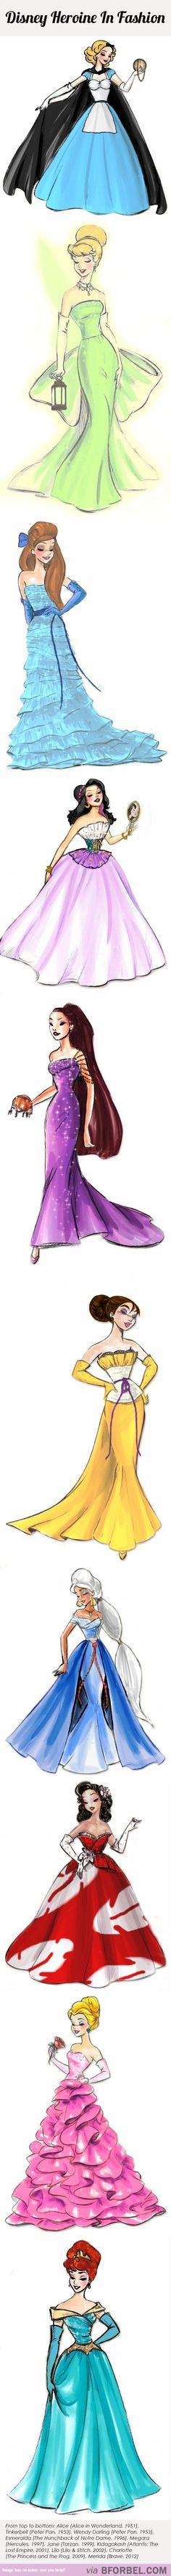 10 Disney Princesses In Fashion….